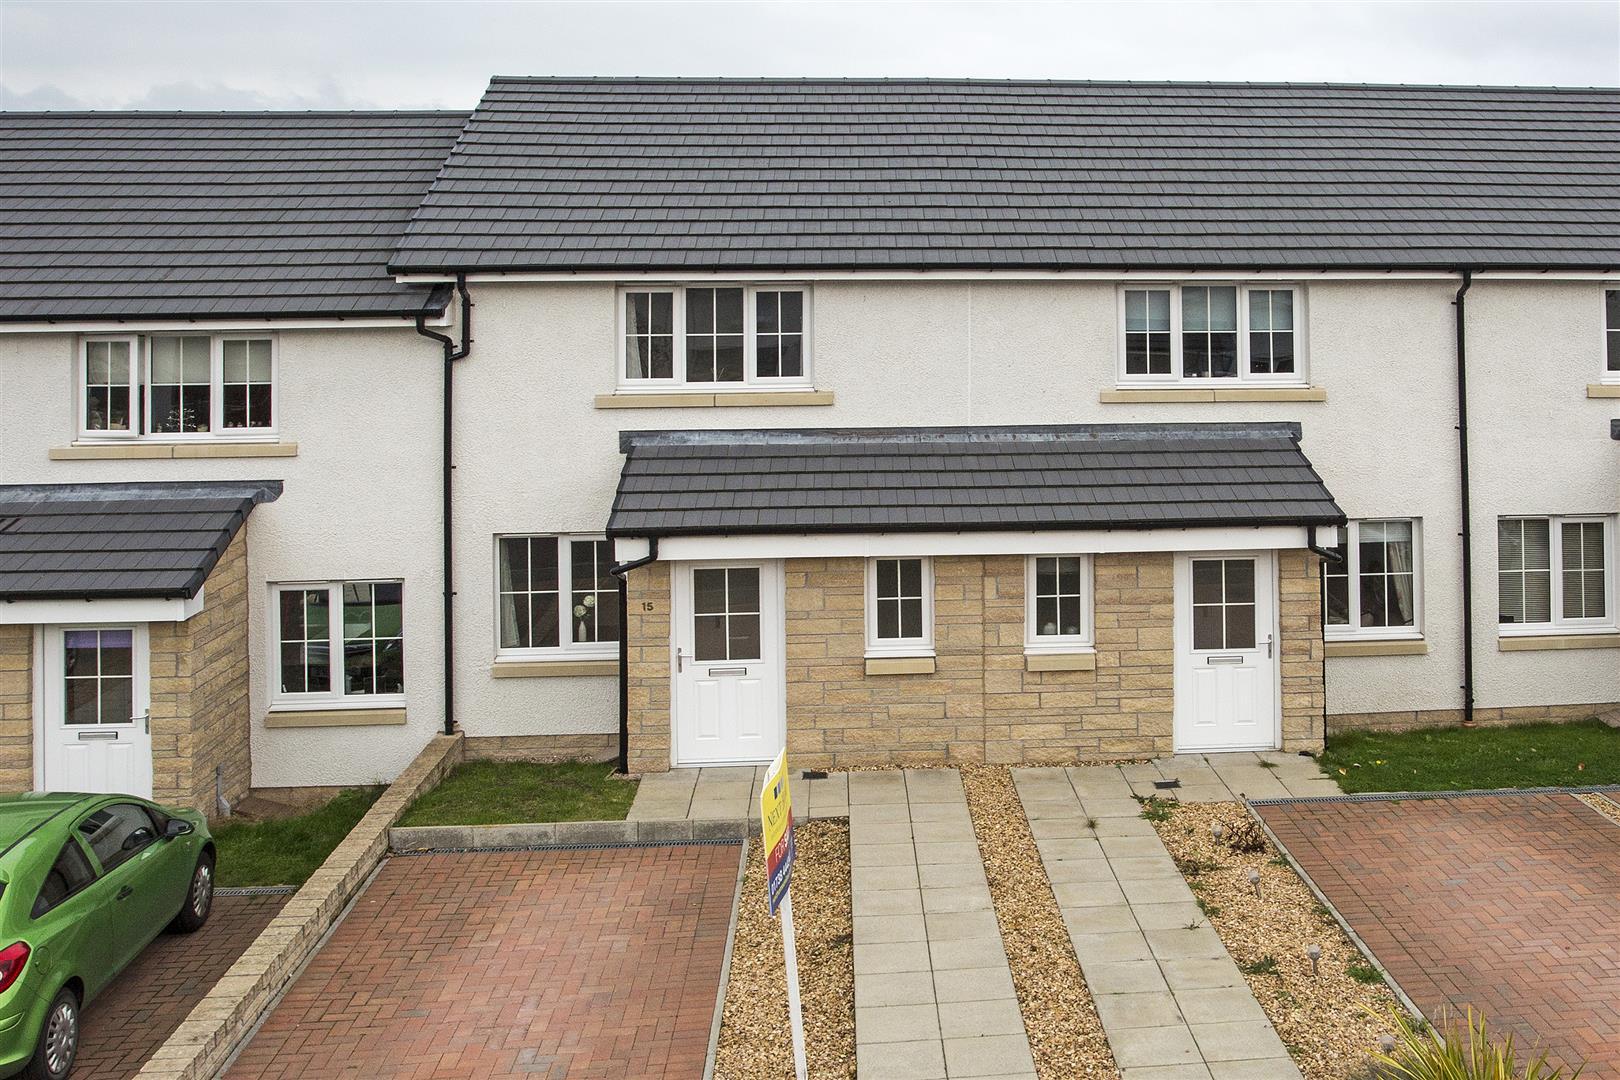 15, Ethel Moorhead Place, Perth, Perthshire, PH2 8FA, UK